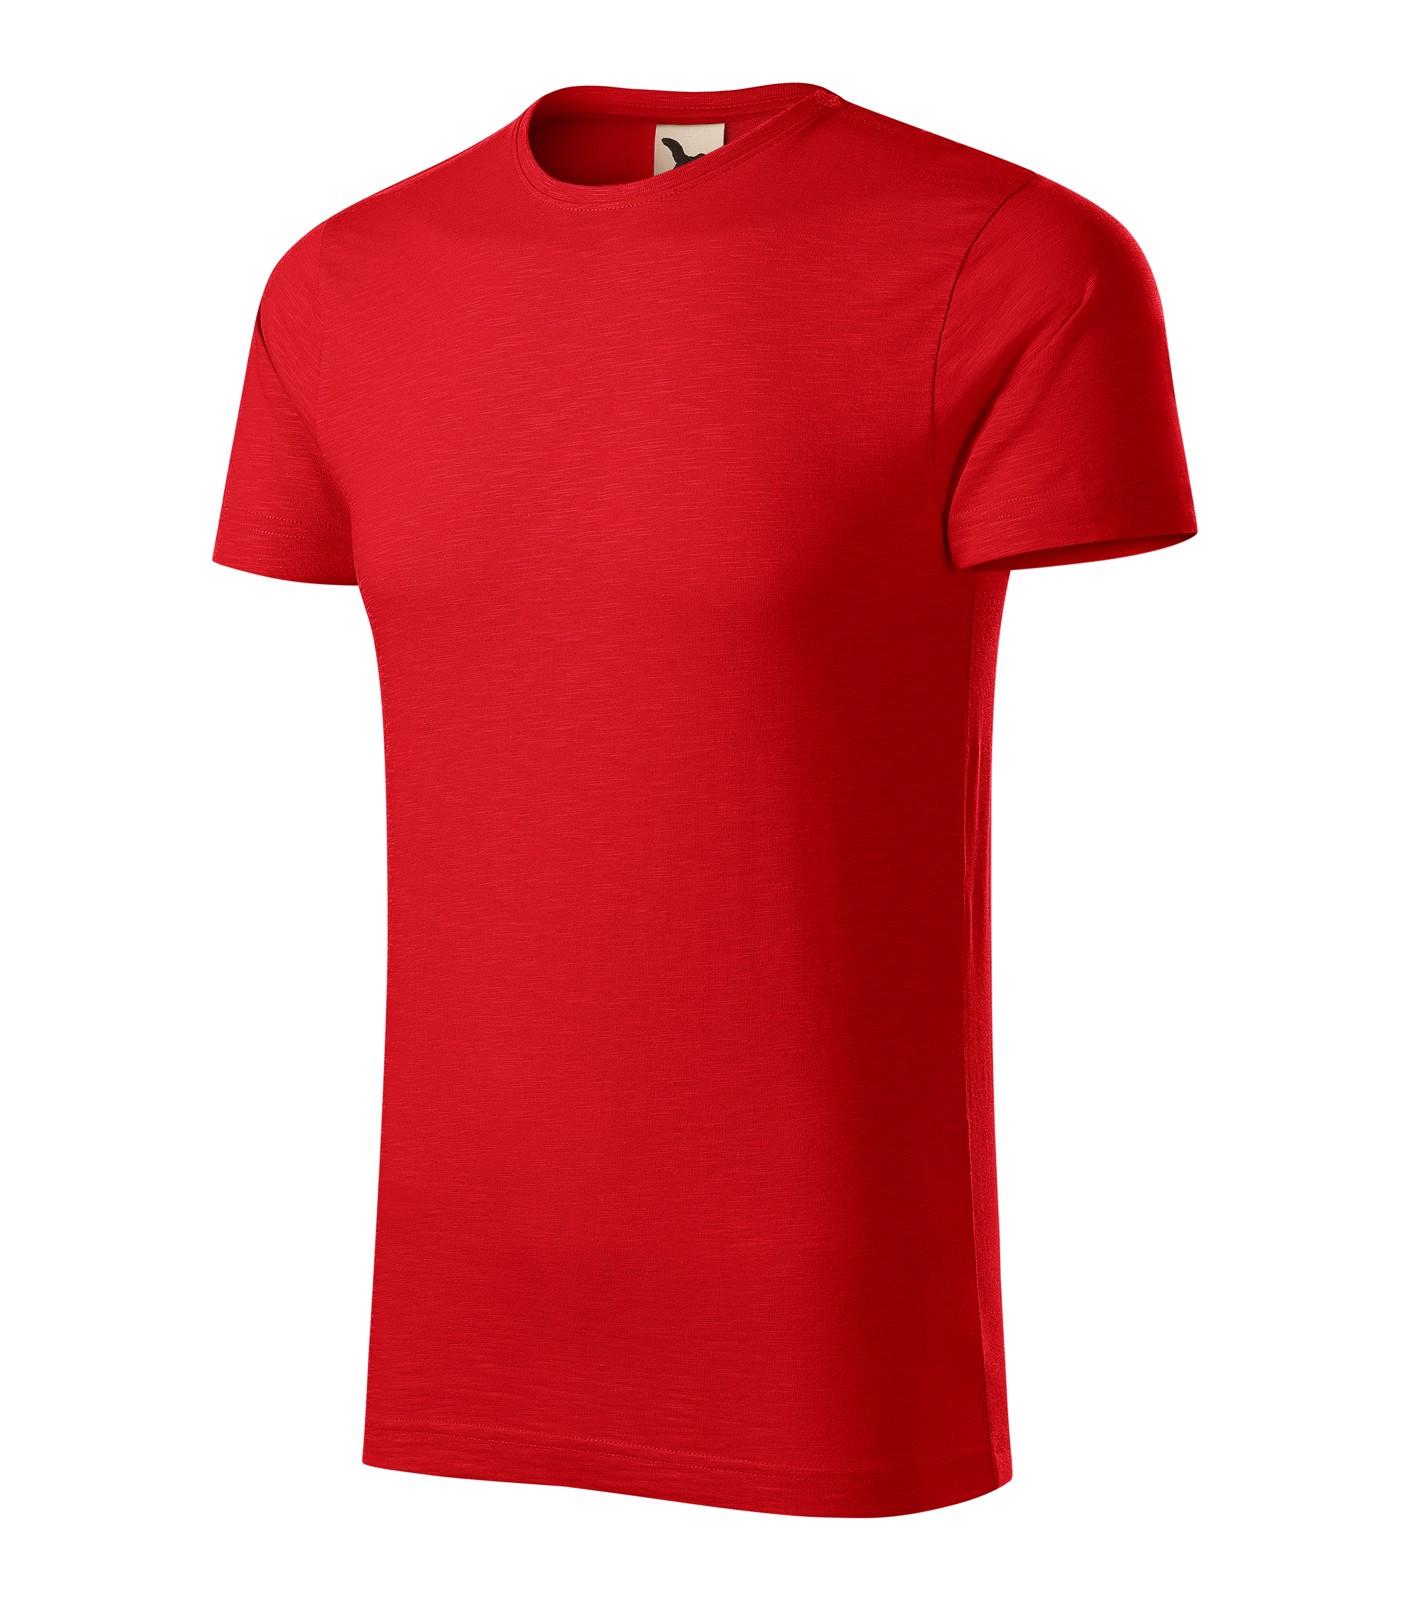 Tričko pánské Malfini Native - Červená / XL